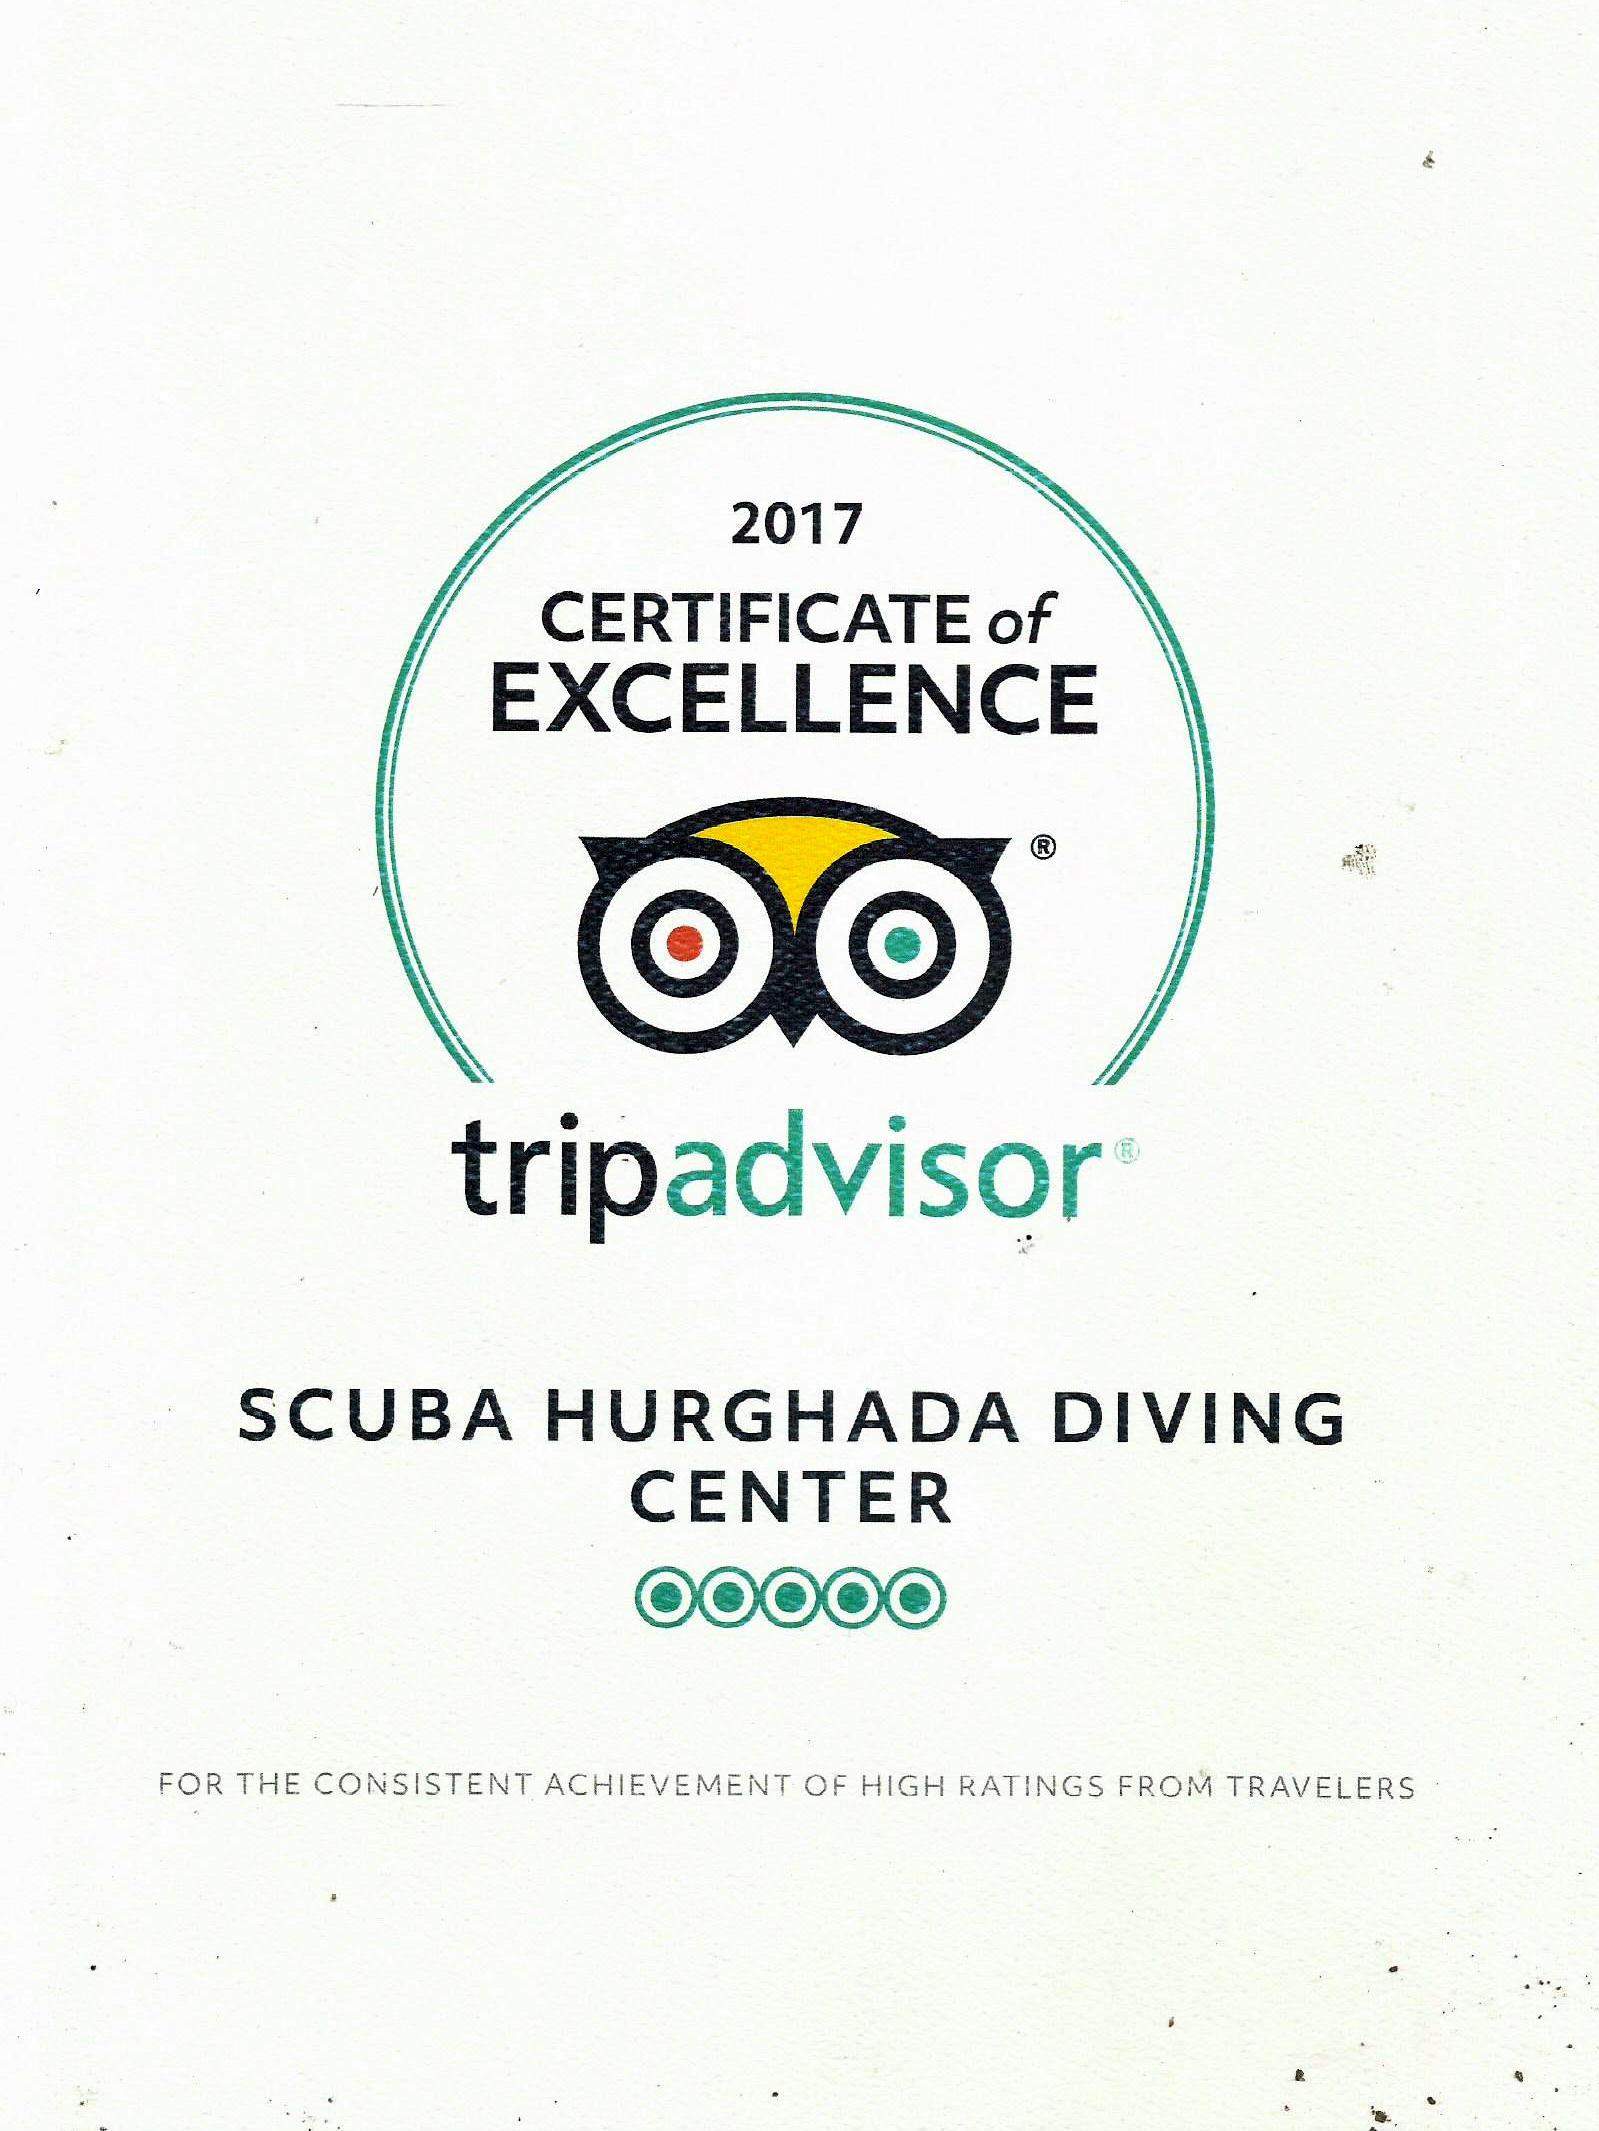 TripAdvisor-Certificate-of-Excellence-2017-Scuba-Hurghada